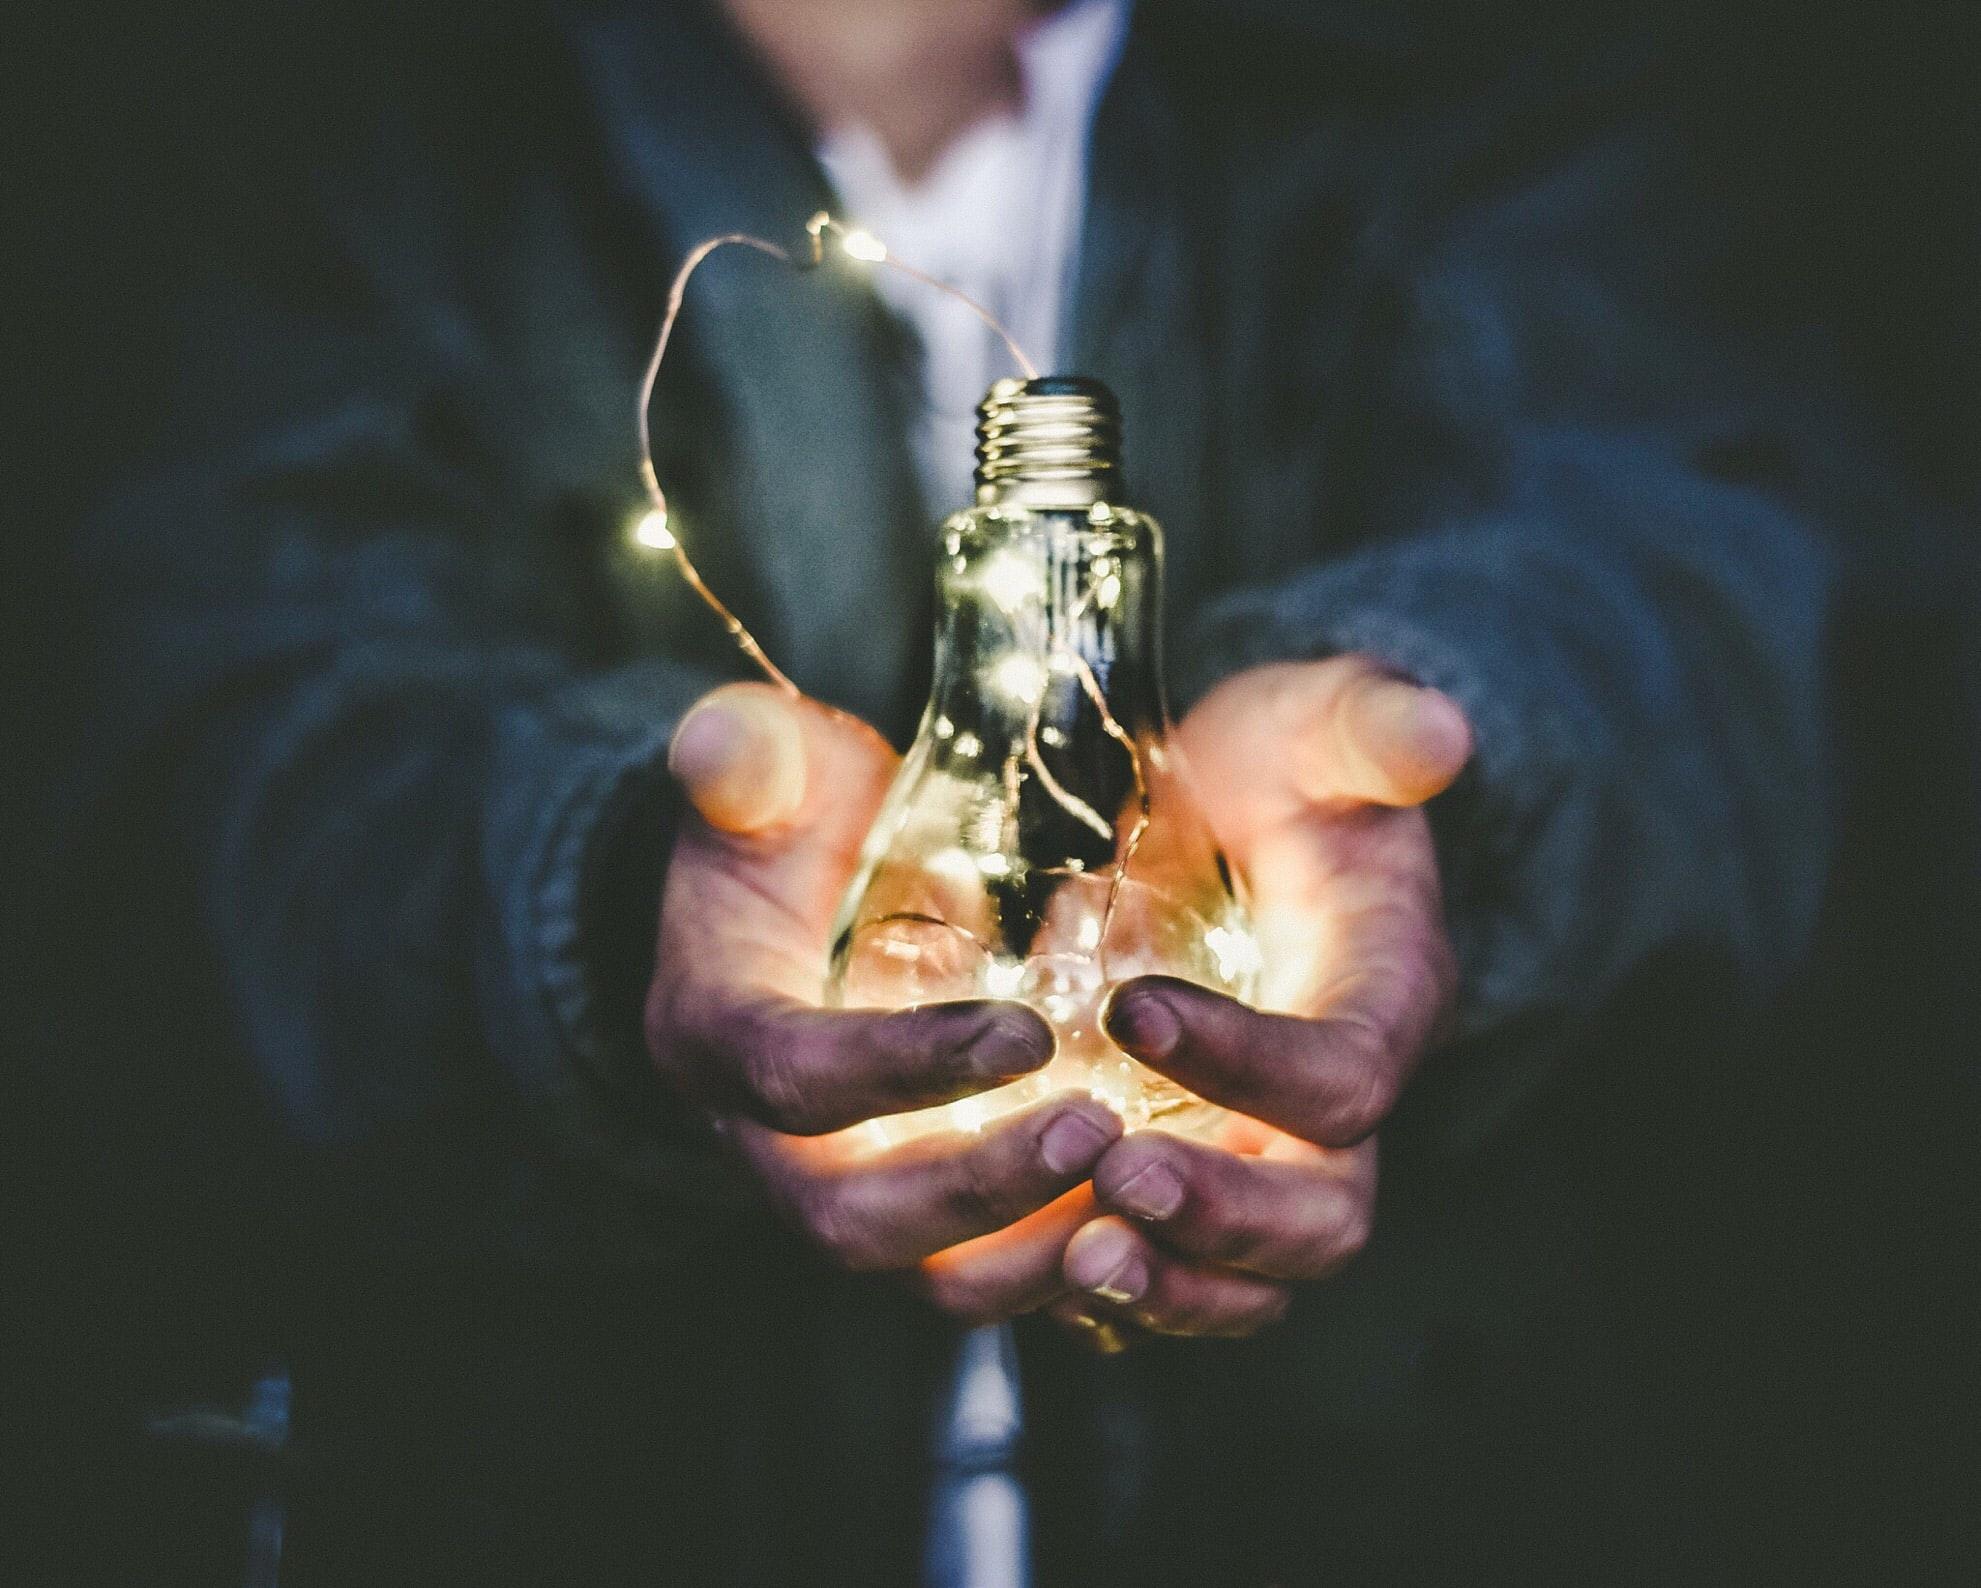 Antreprenori de succes. Meet the entrepreneur